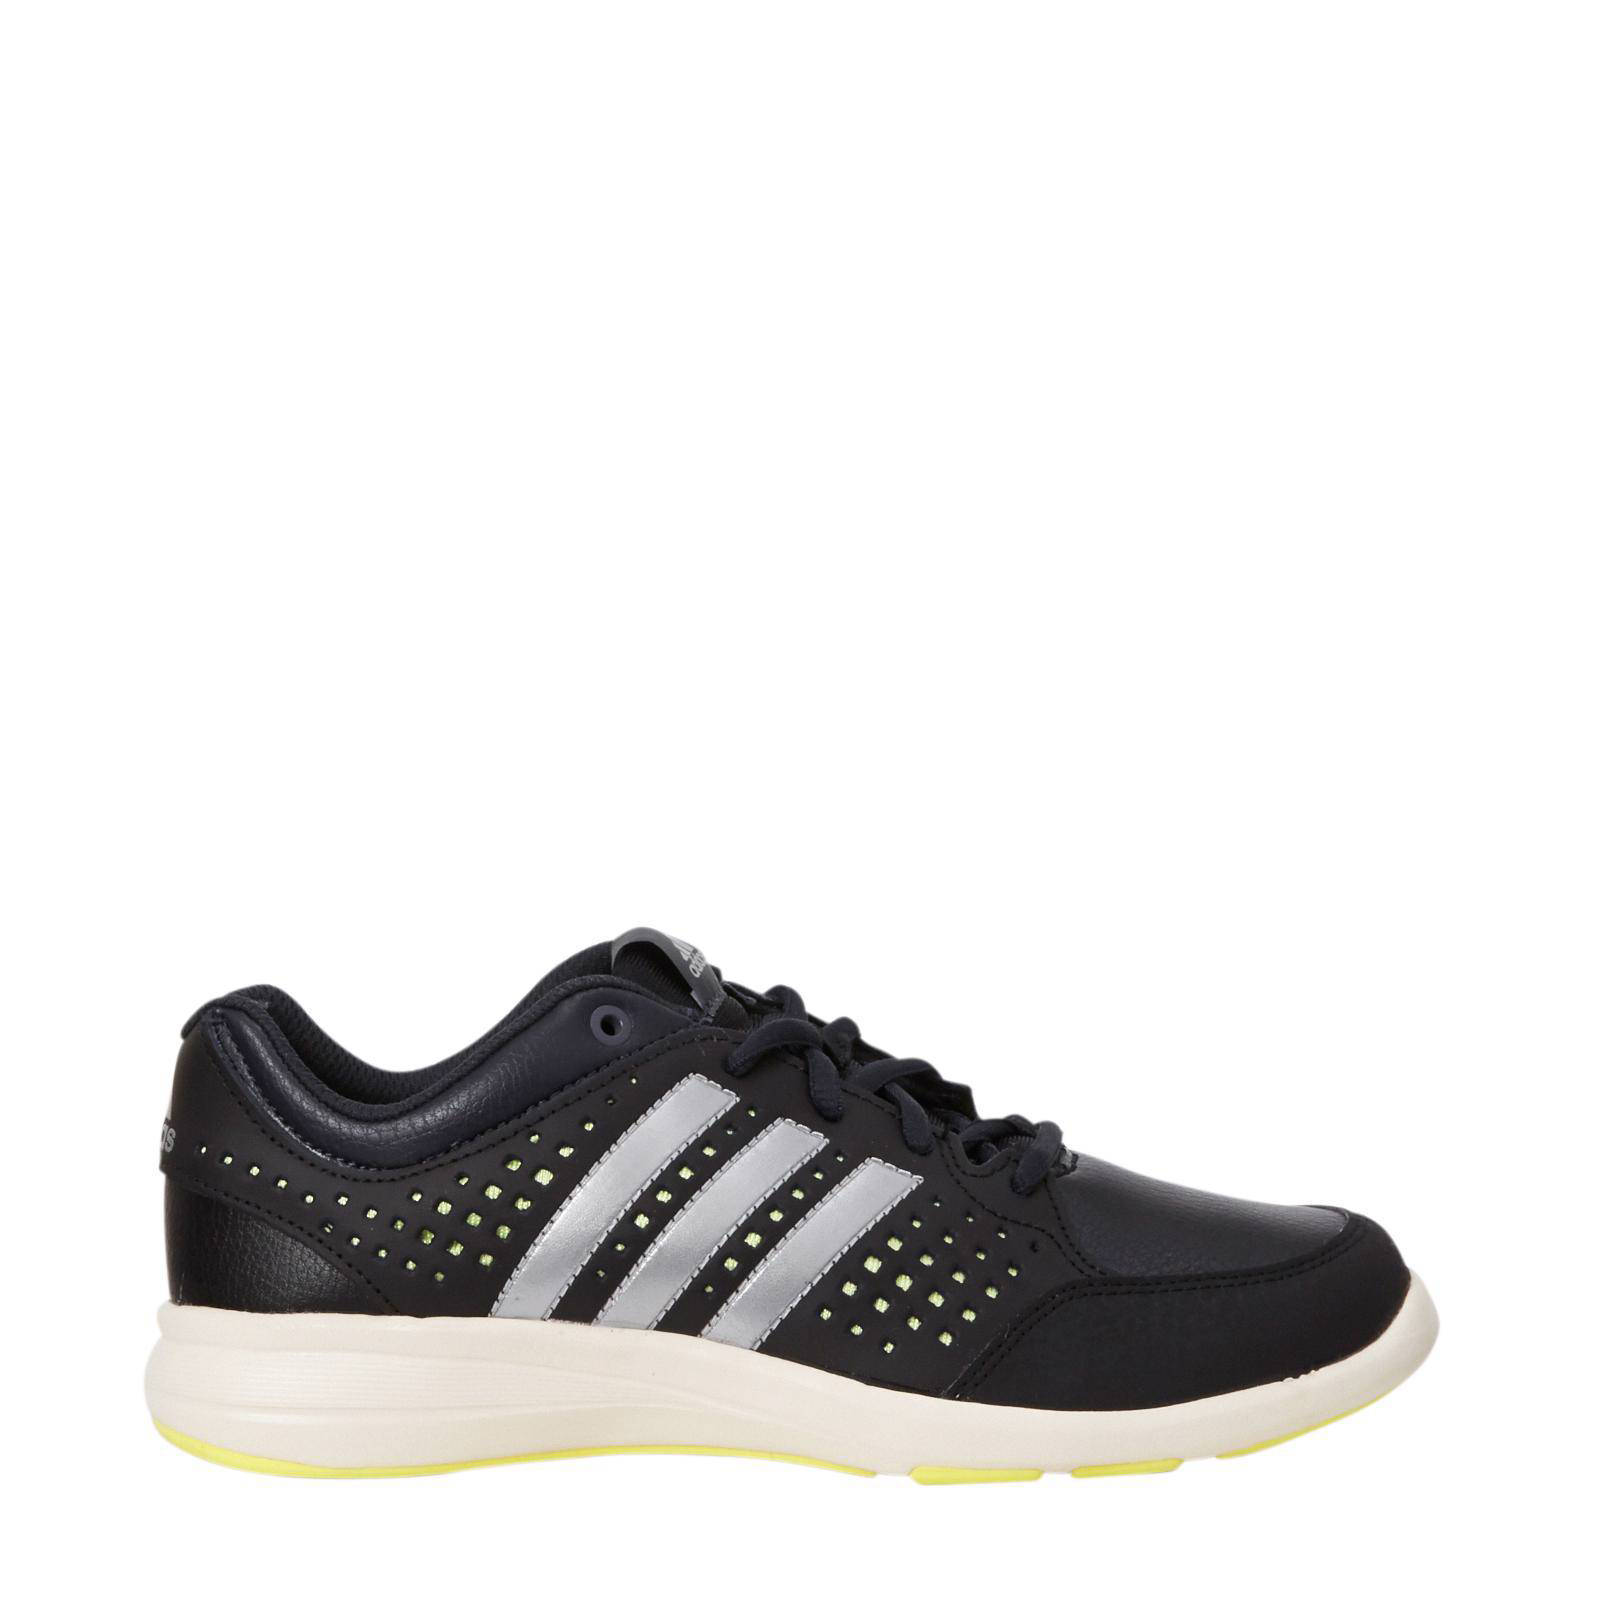 Adidas Fitness Schoenen 3Wehkamp Performance Arianna P80wnOk